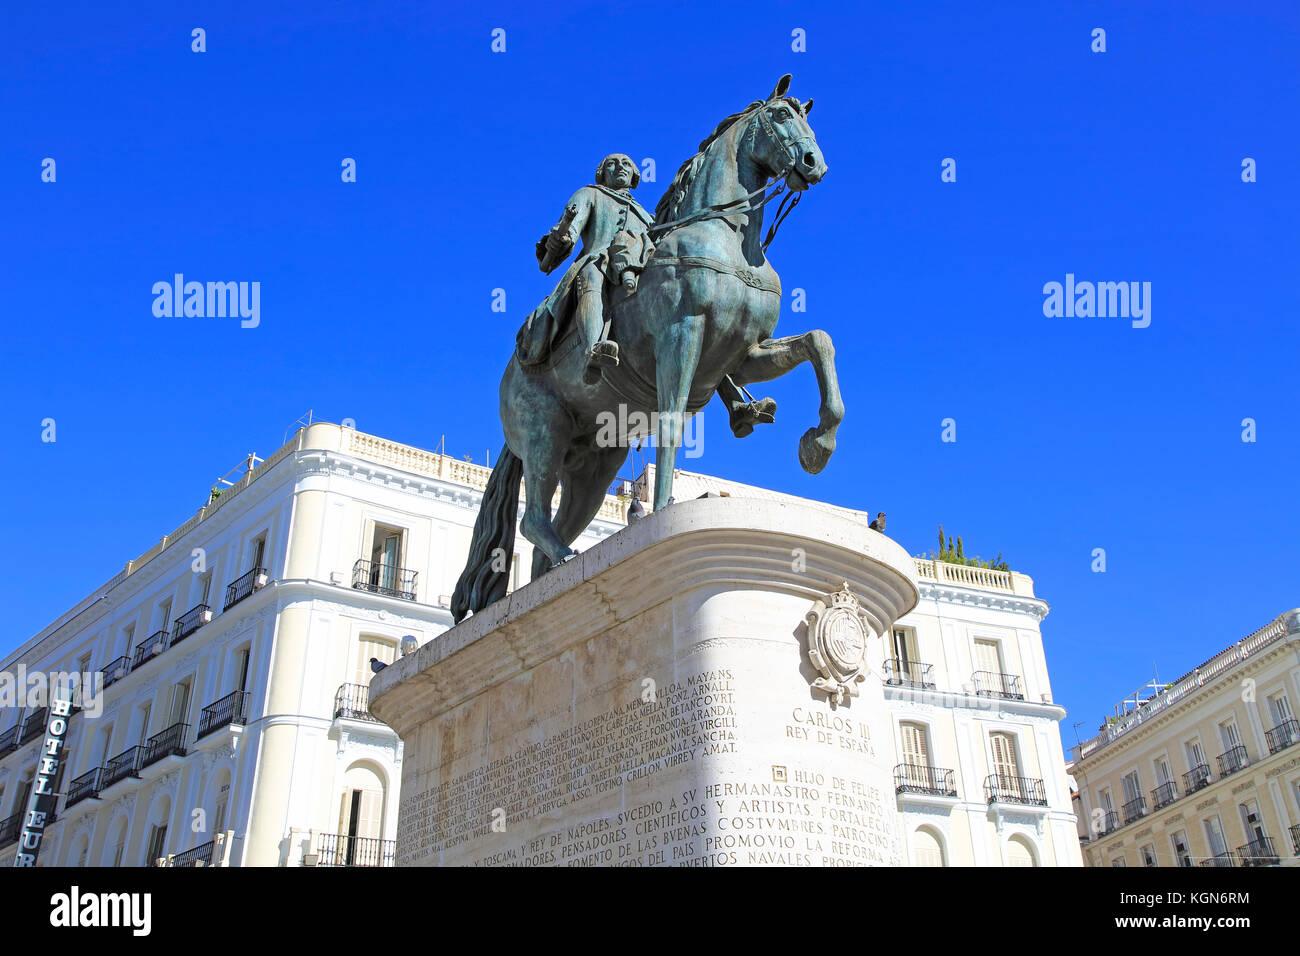 Madrid city centre stock photos madrid city centre stock for Plaza de la puerta del sol